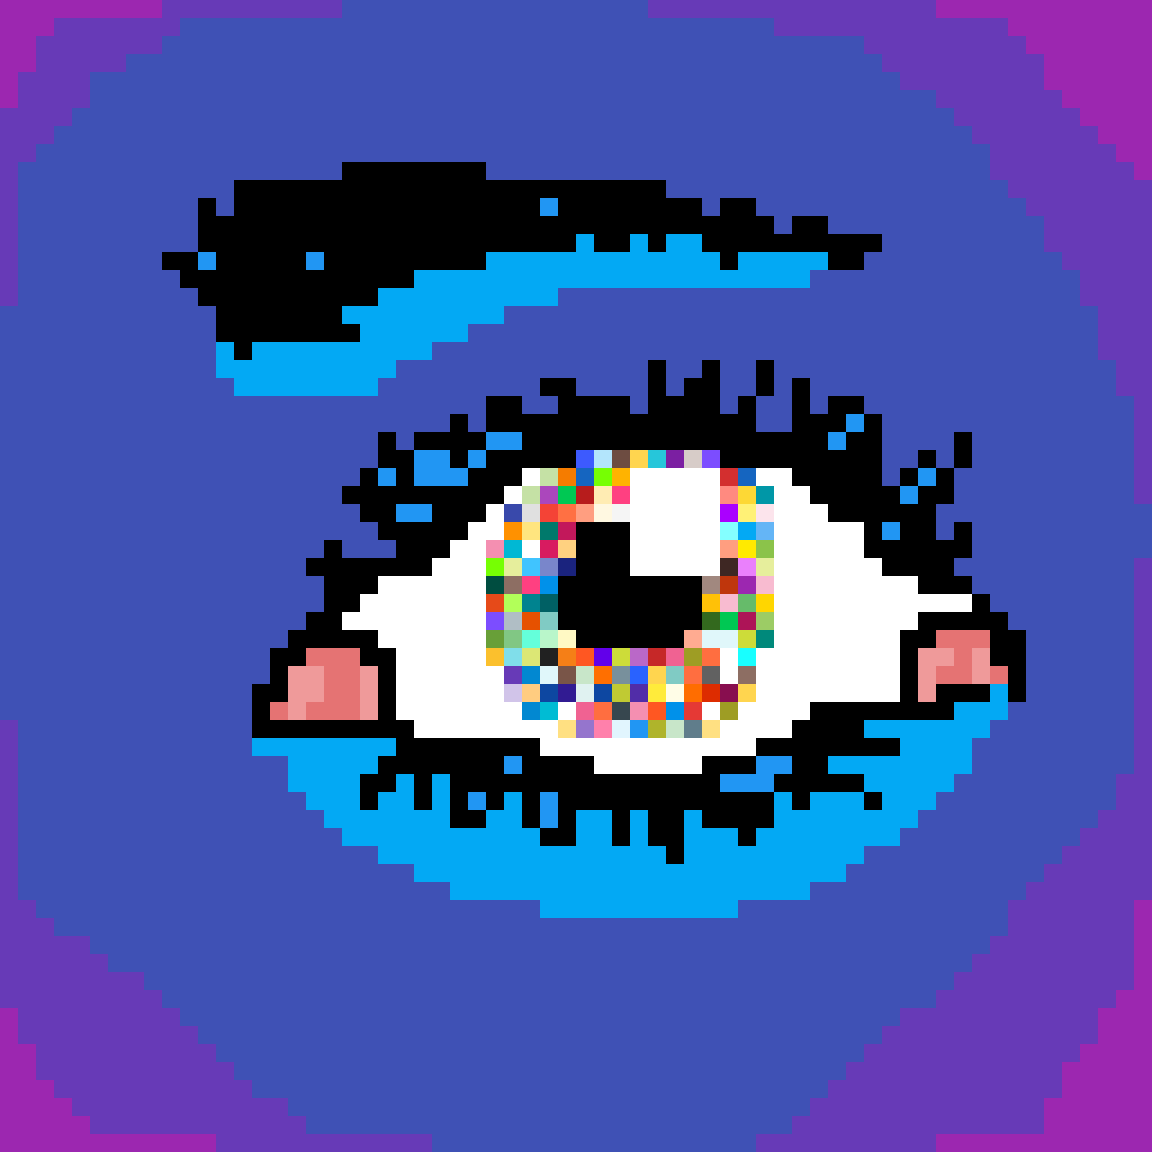 Eye am creative (not) by HoneyLee